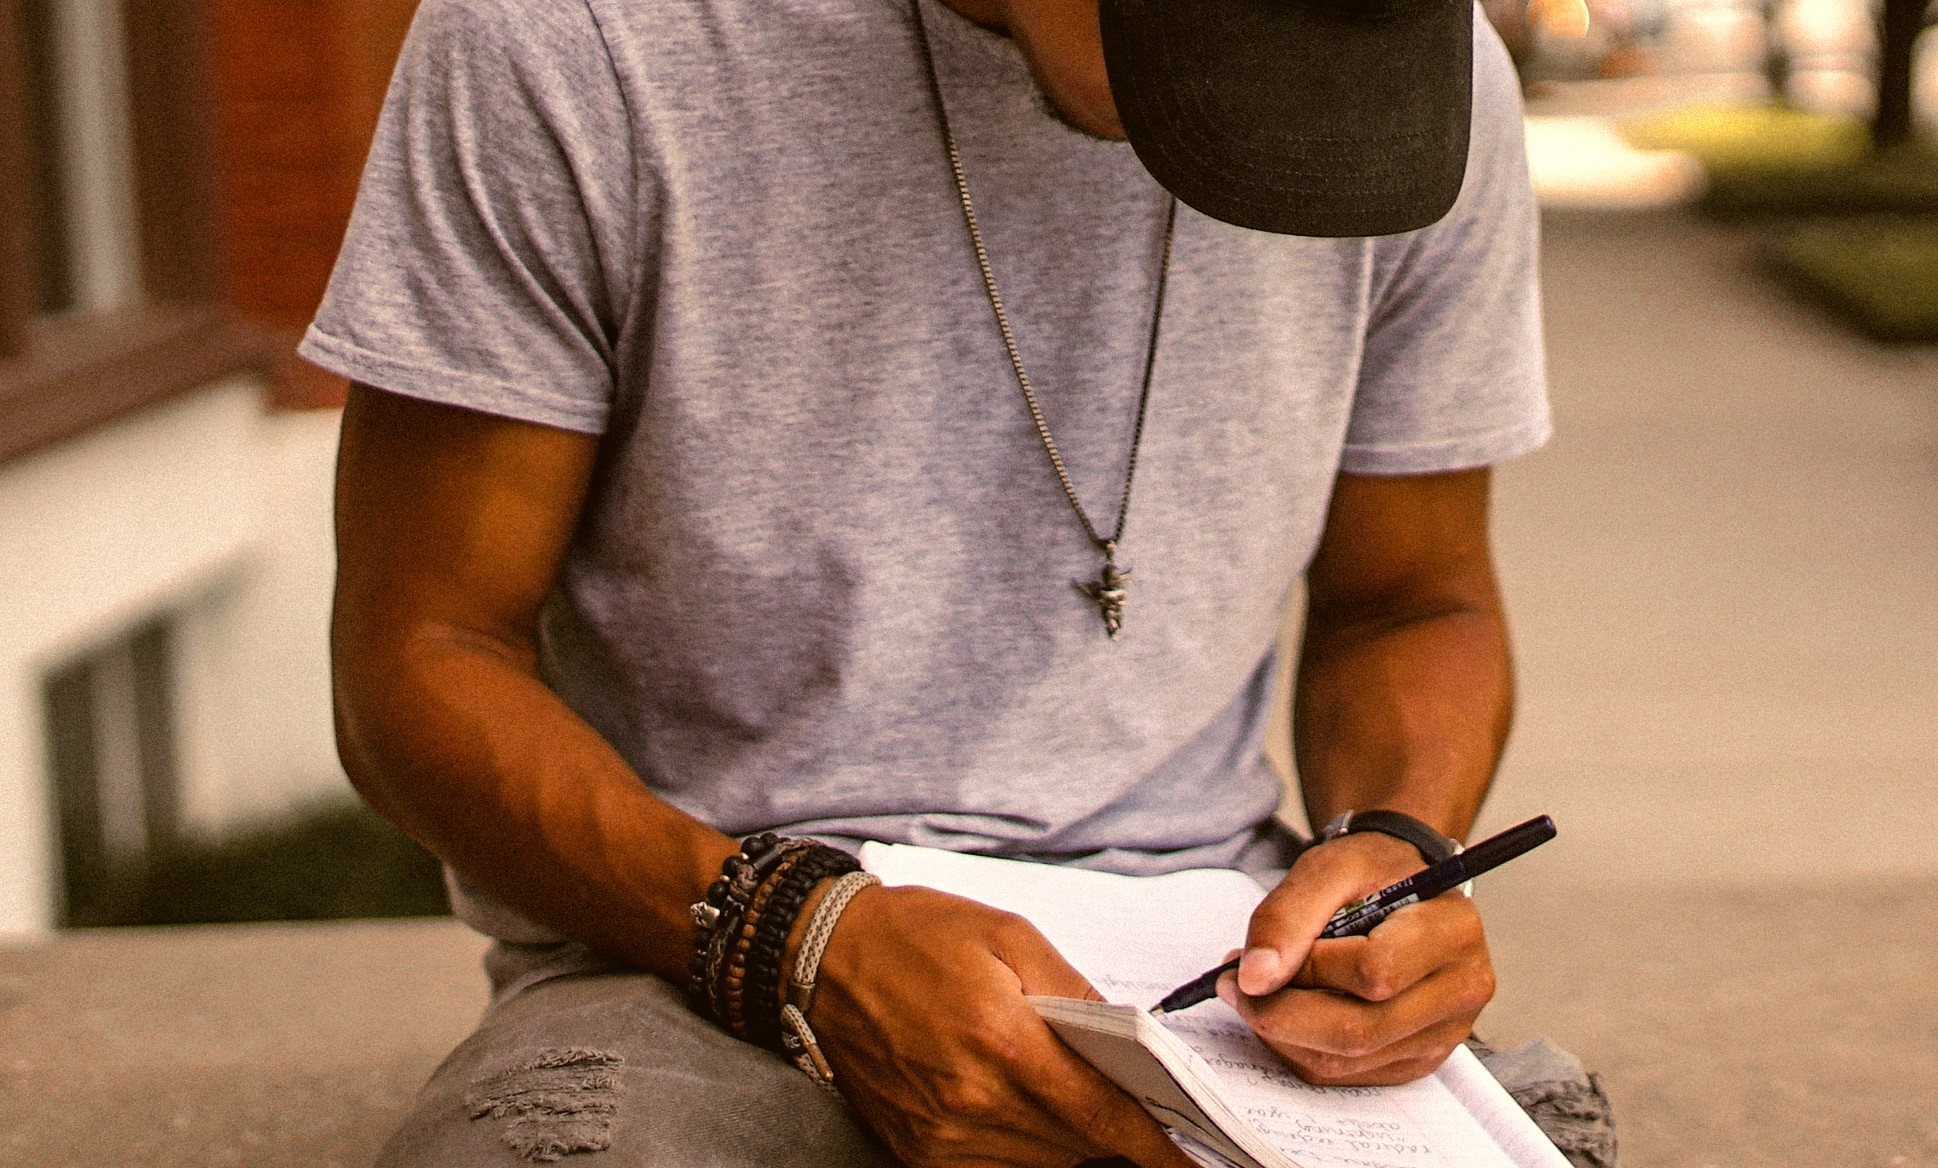 Scrivere, oggi